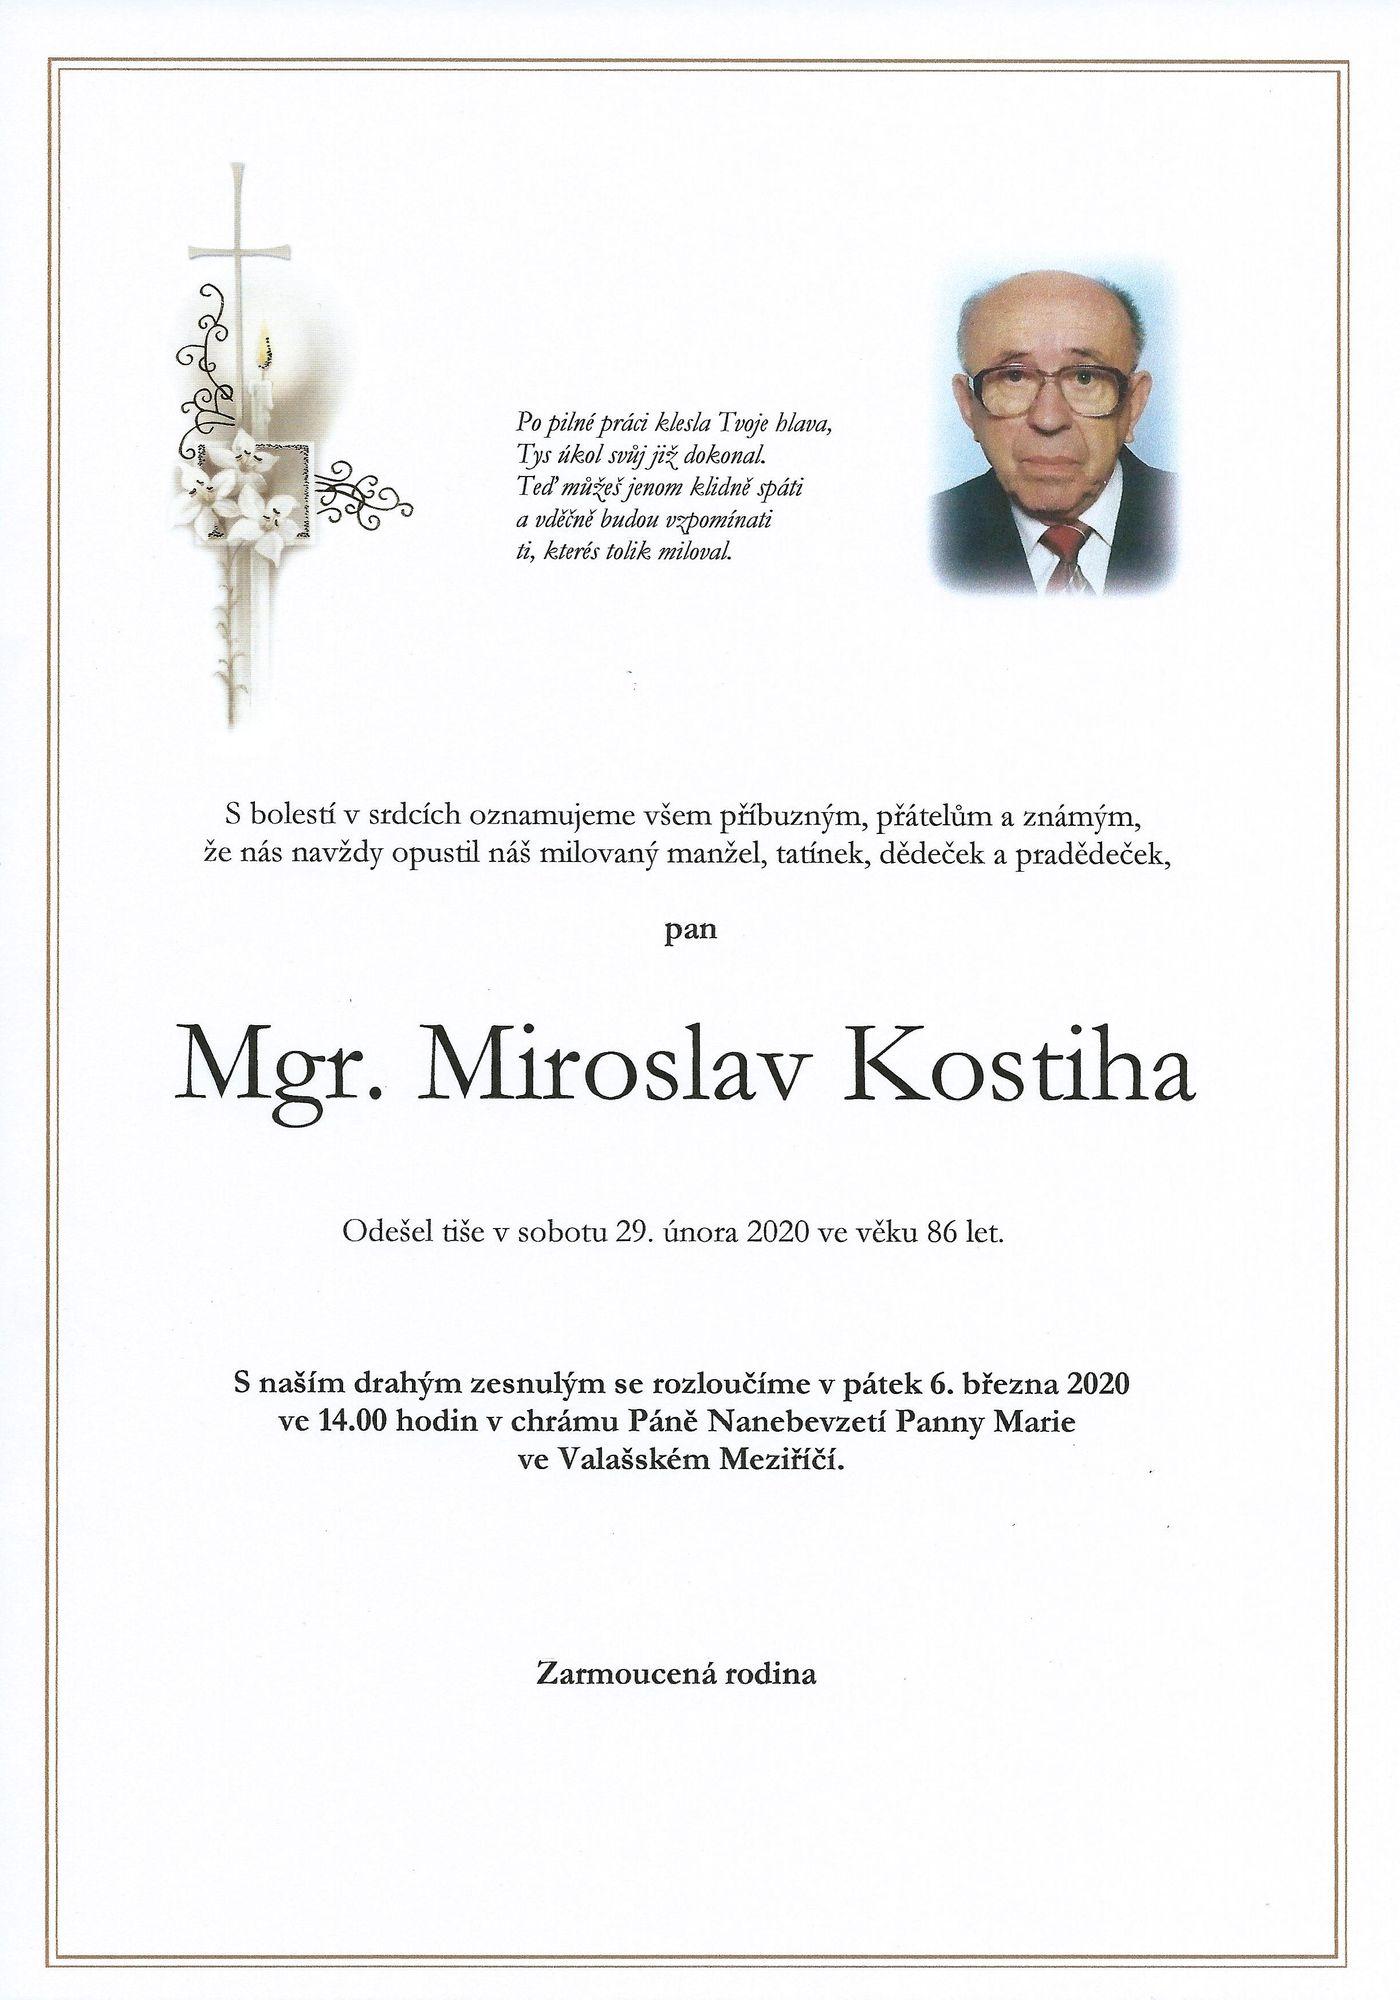 Mgr. Miroslav Kostiha